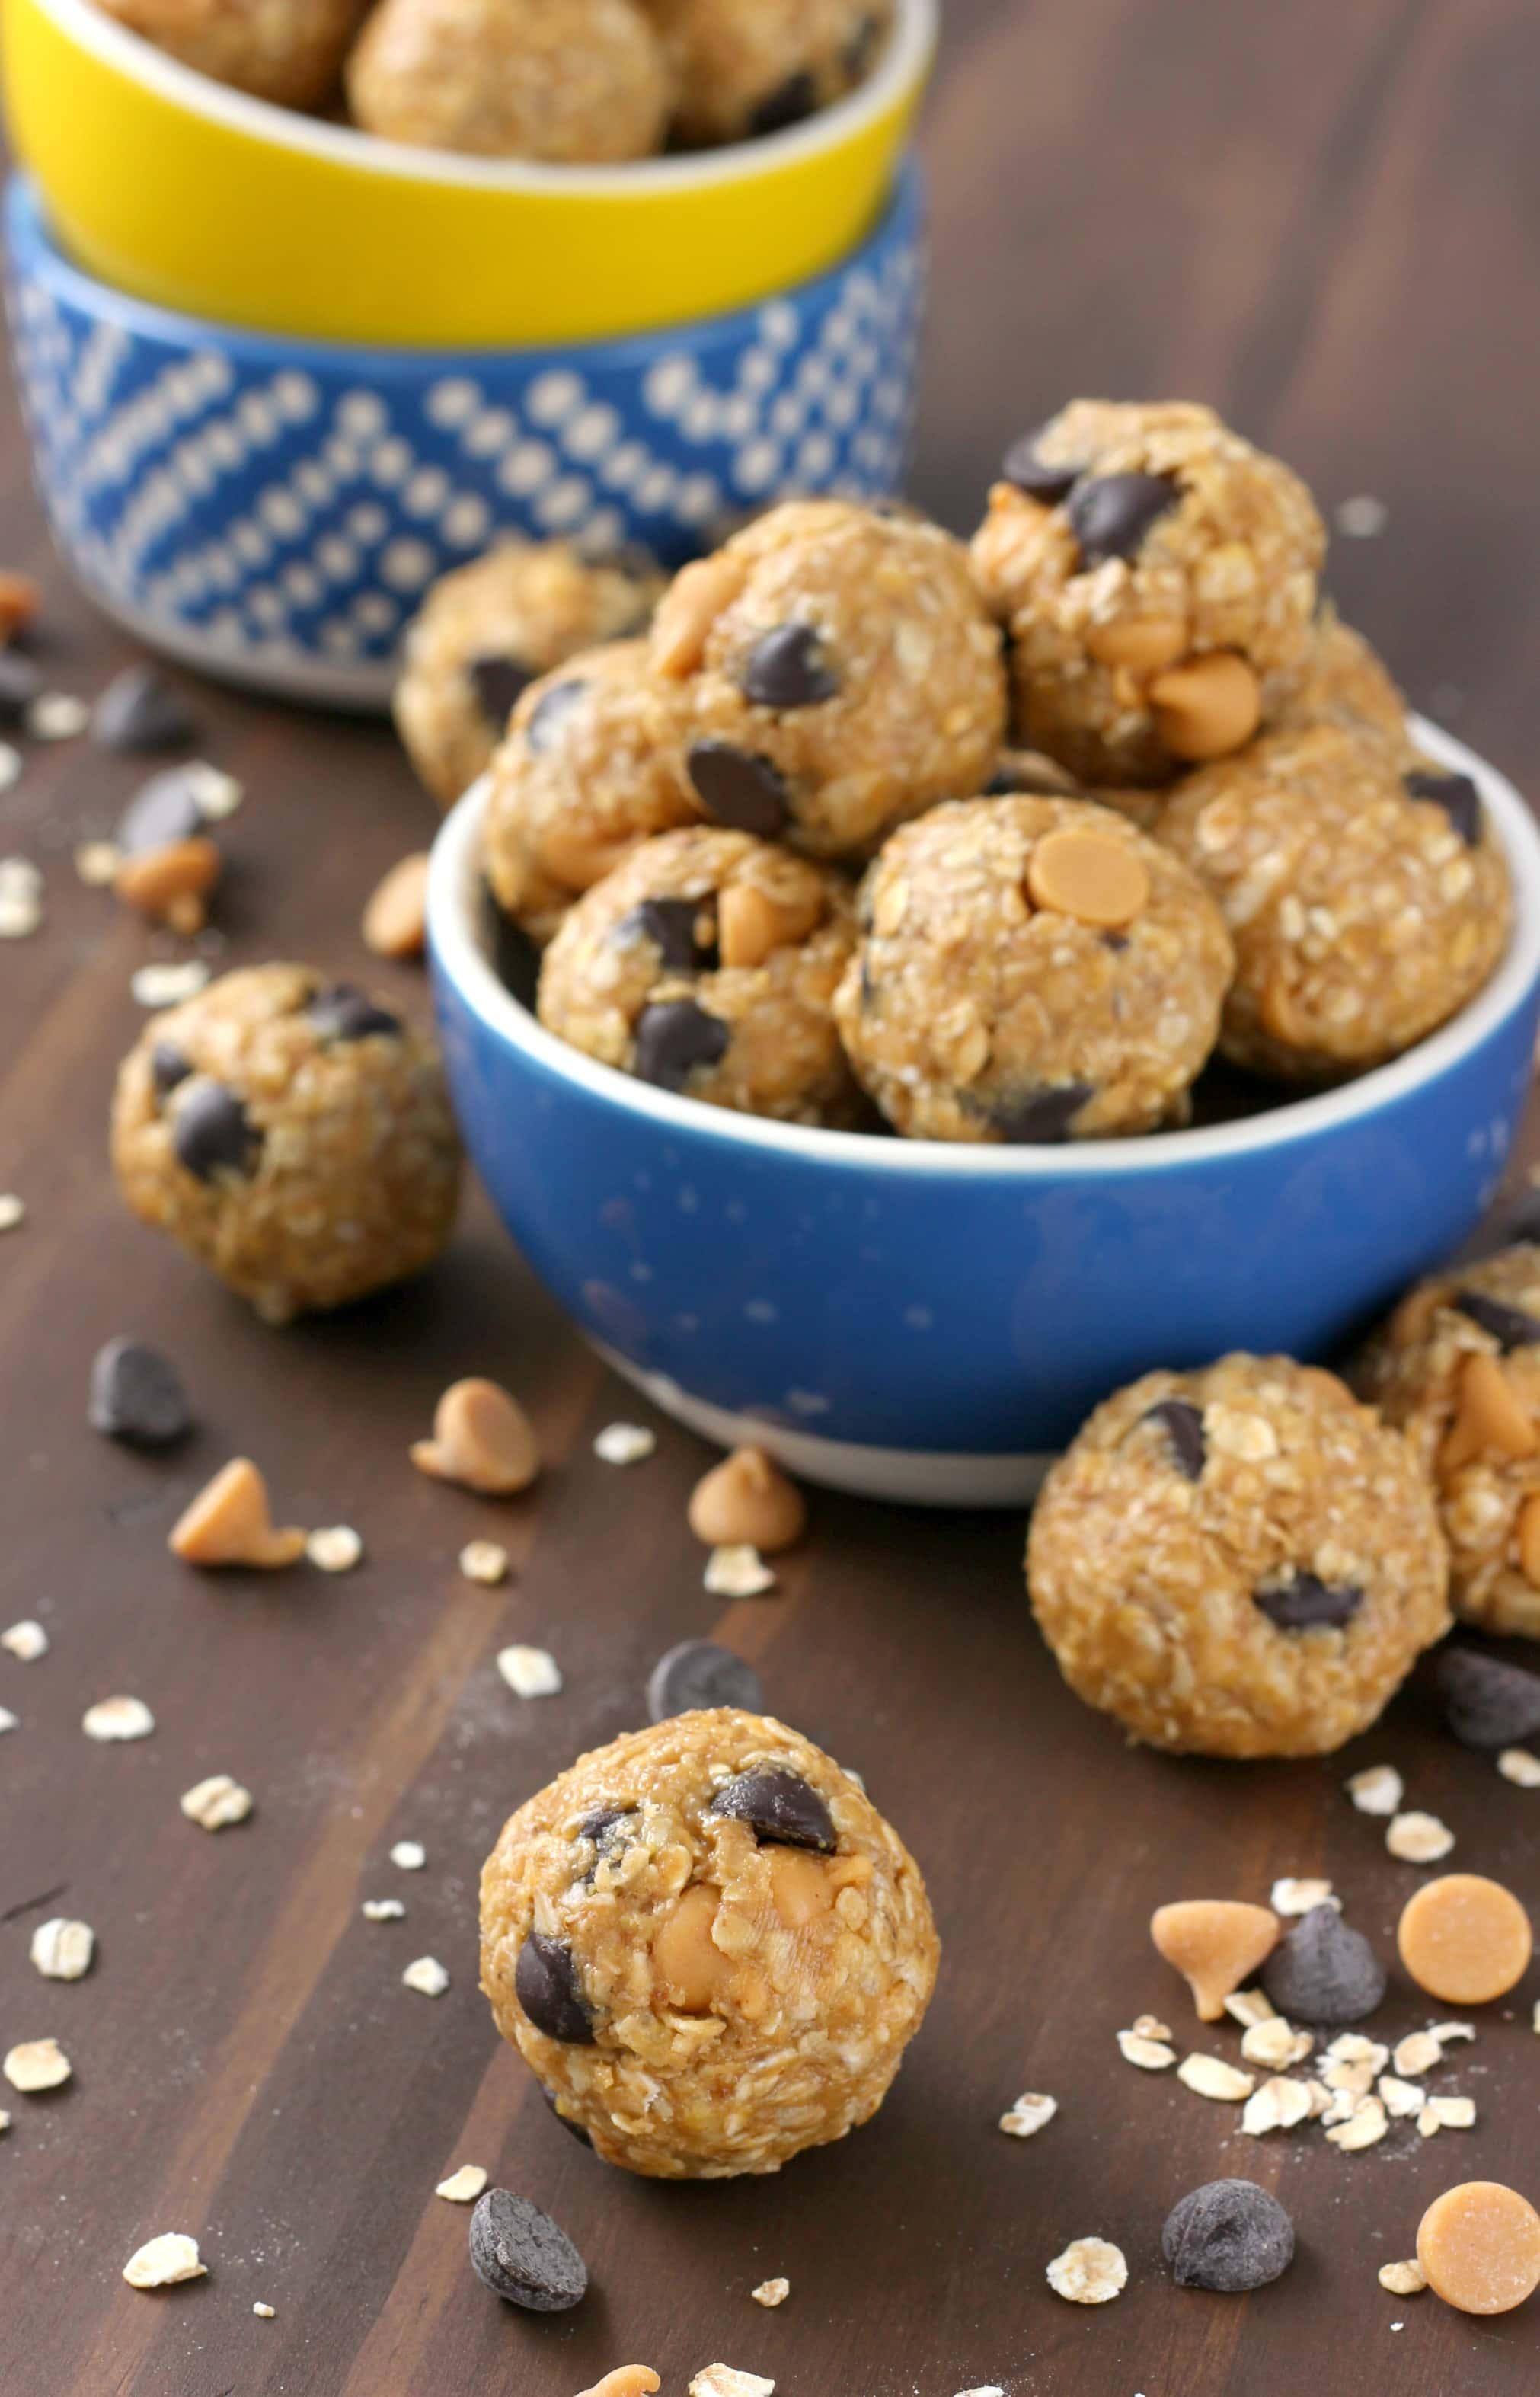 Peanut Butter Dark Chocolate Chips No Bake Granola Bites Recipe from A Kitchen Addiction